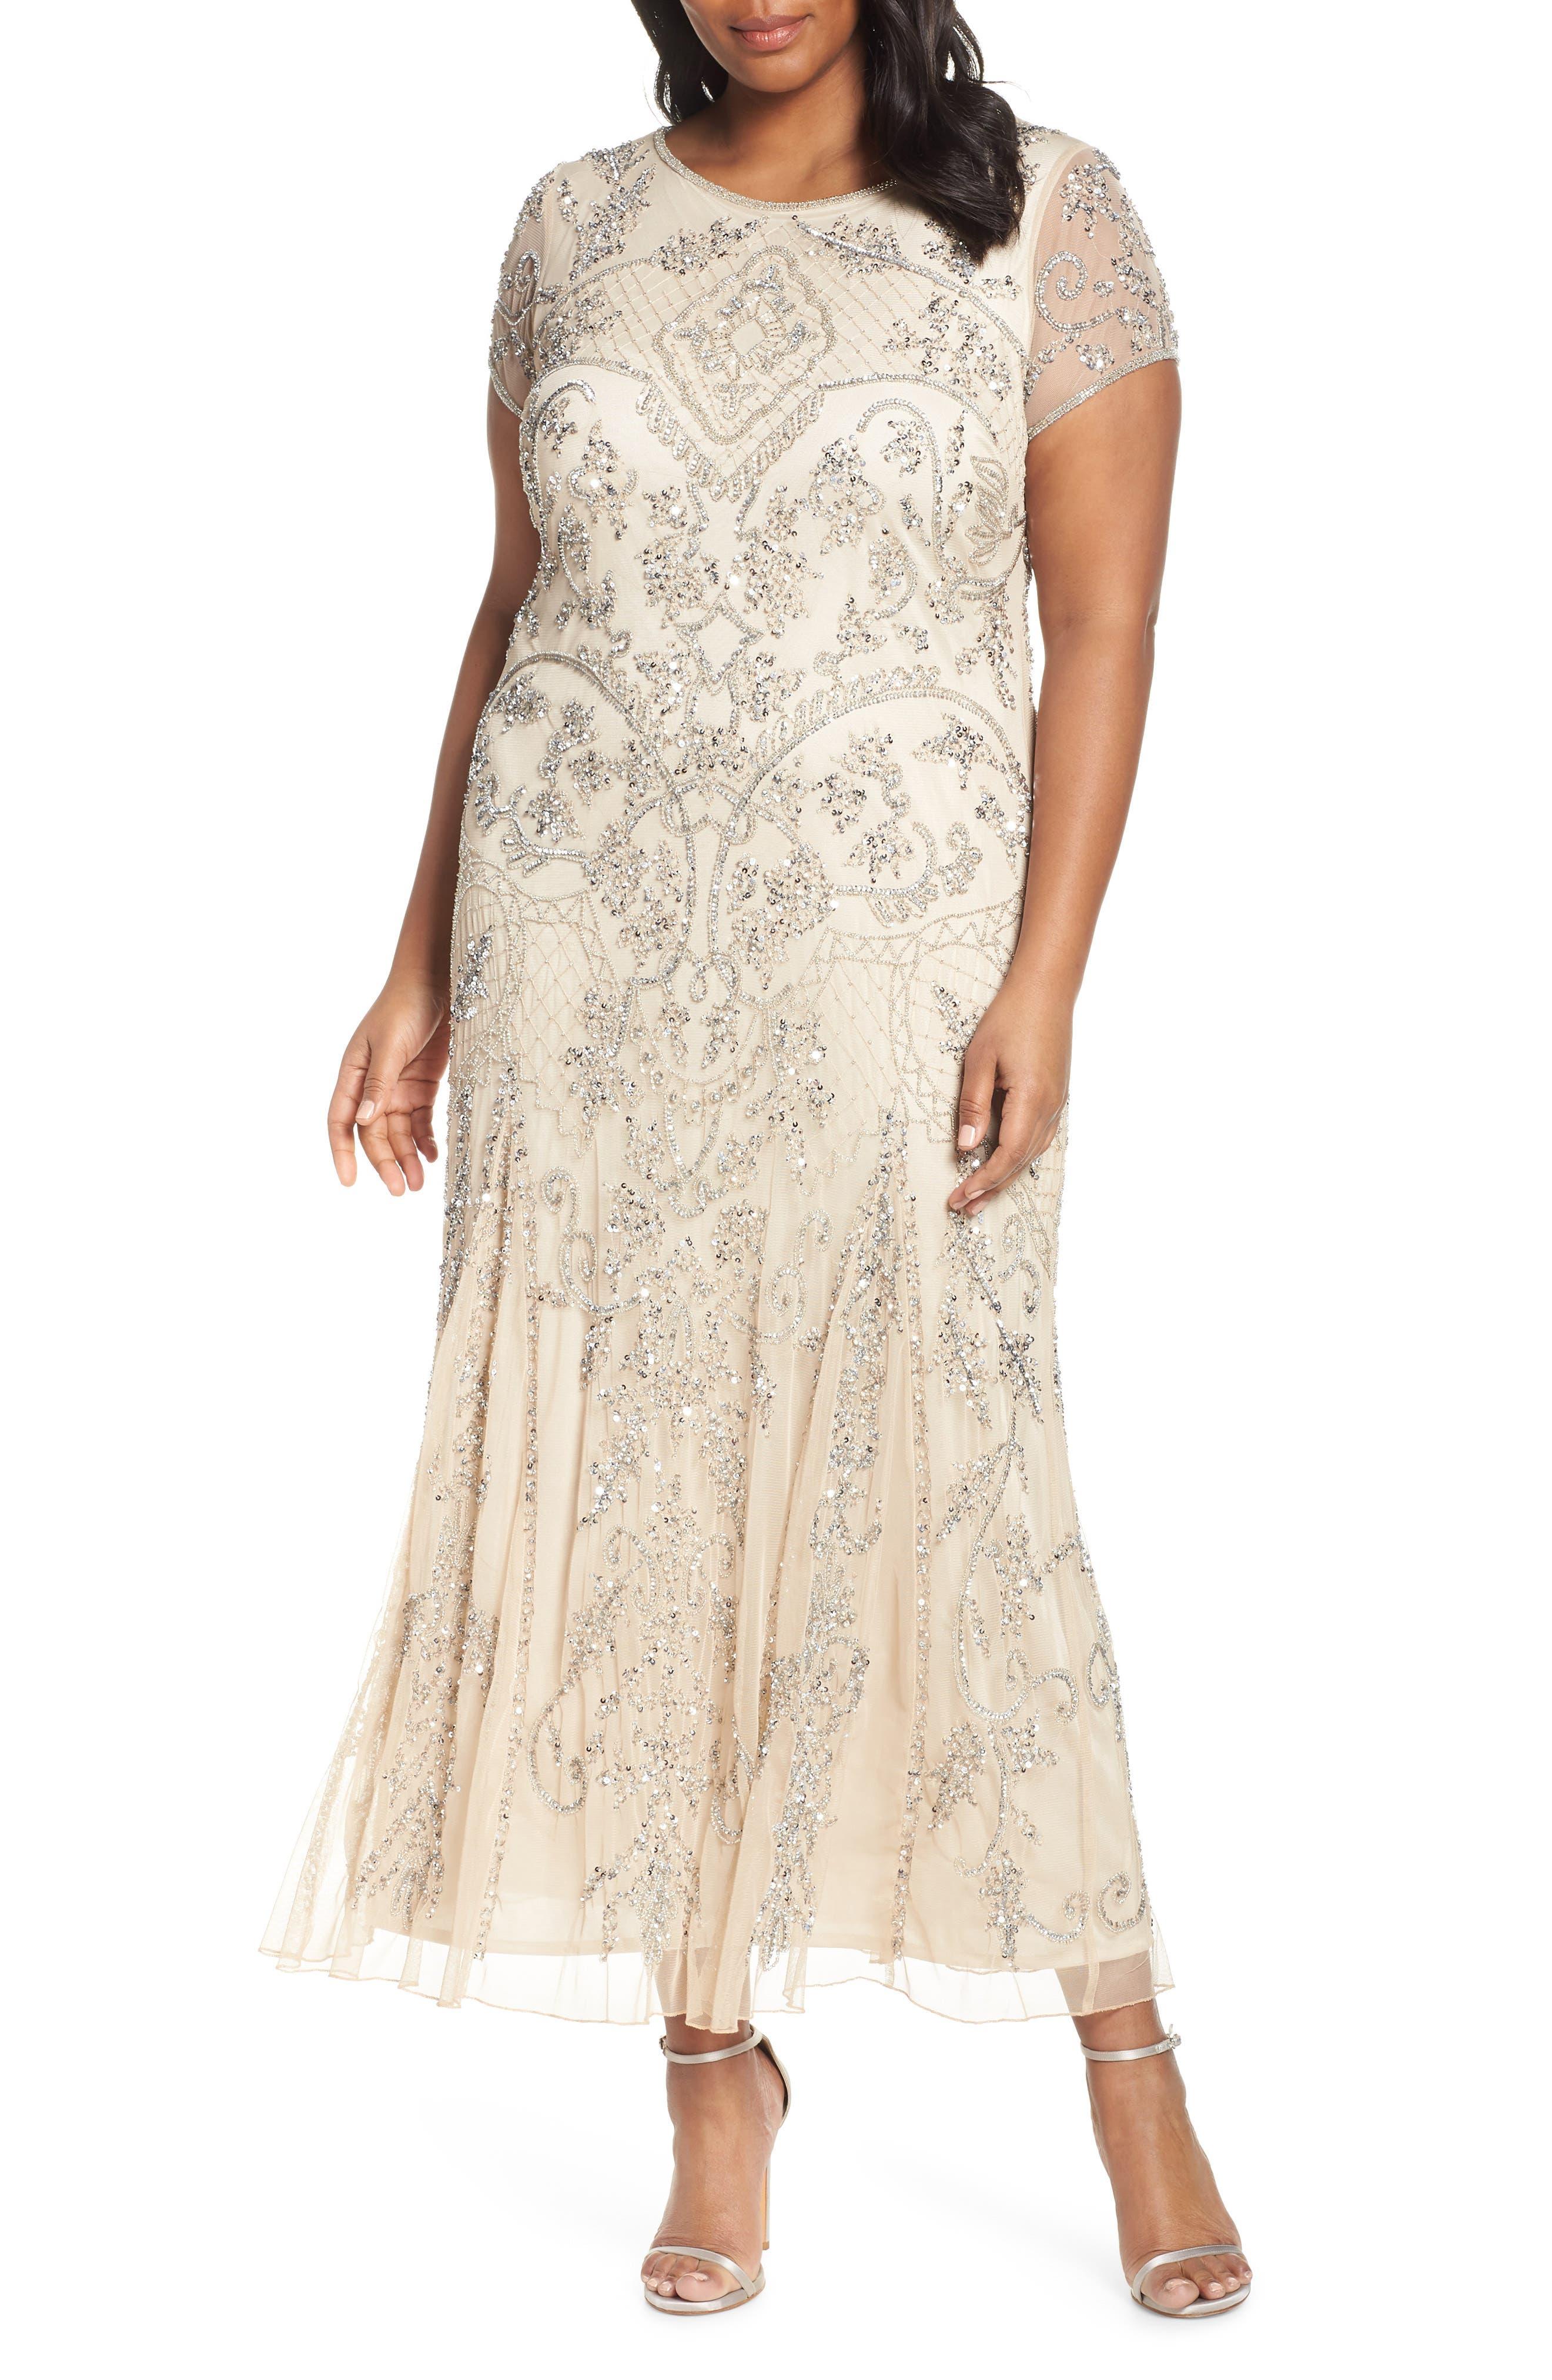 Vintage Inspired Wedding Dress | Vintage Style Wedding Dresses Plus Size Womens Pisarro Nights Beaded Short Sleeve Column Gown Size 24W - Metallic $148.80 AT vintagedancer.com